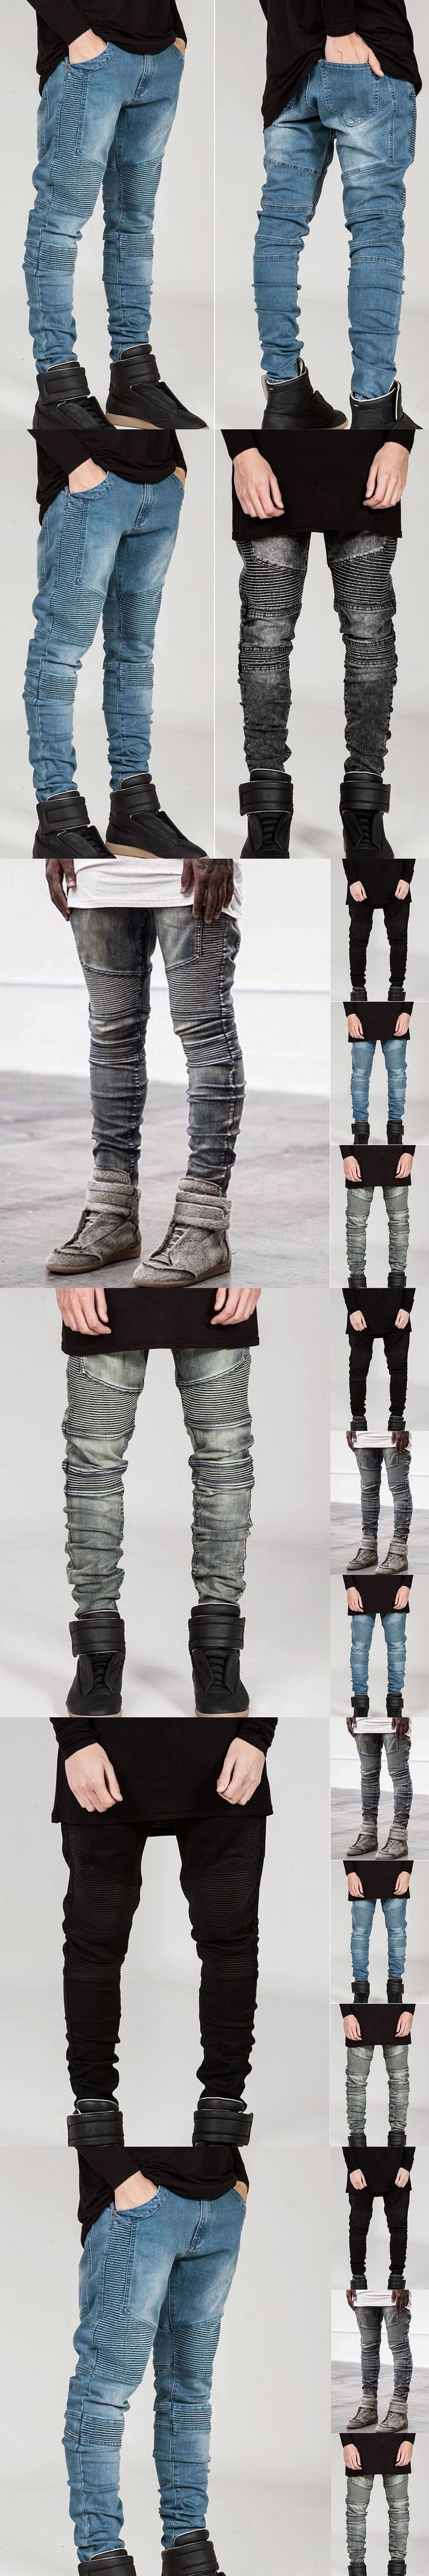 Mens Skinny Biker Jeans Men 2016 Street Ripped Rider Denim Motorcycle Runway Slim Fit Washed Moto Denim Pants Joggers 01Z999